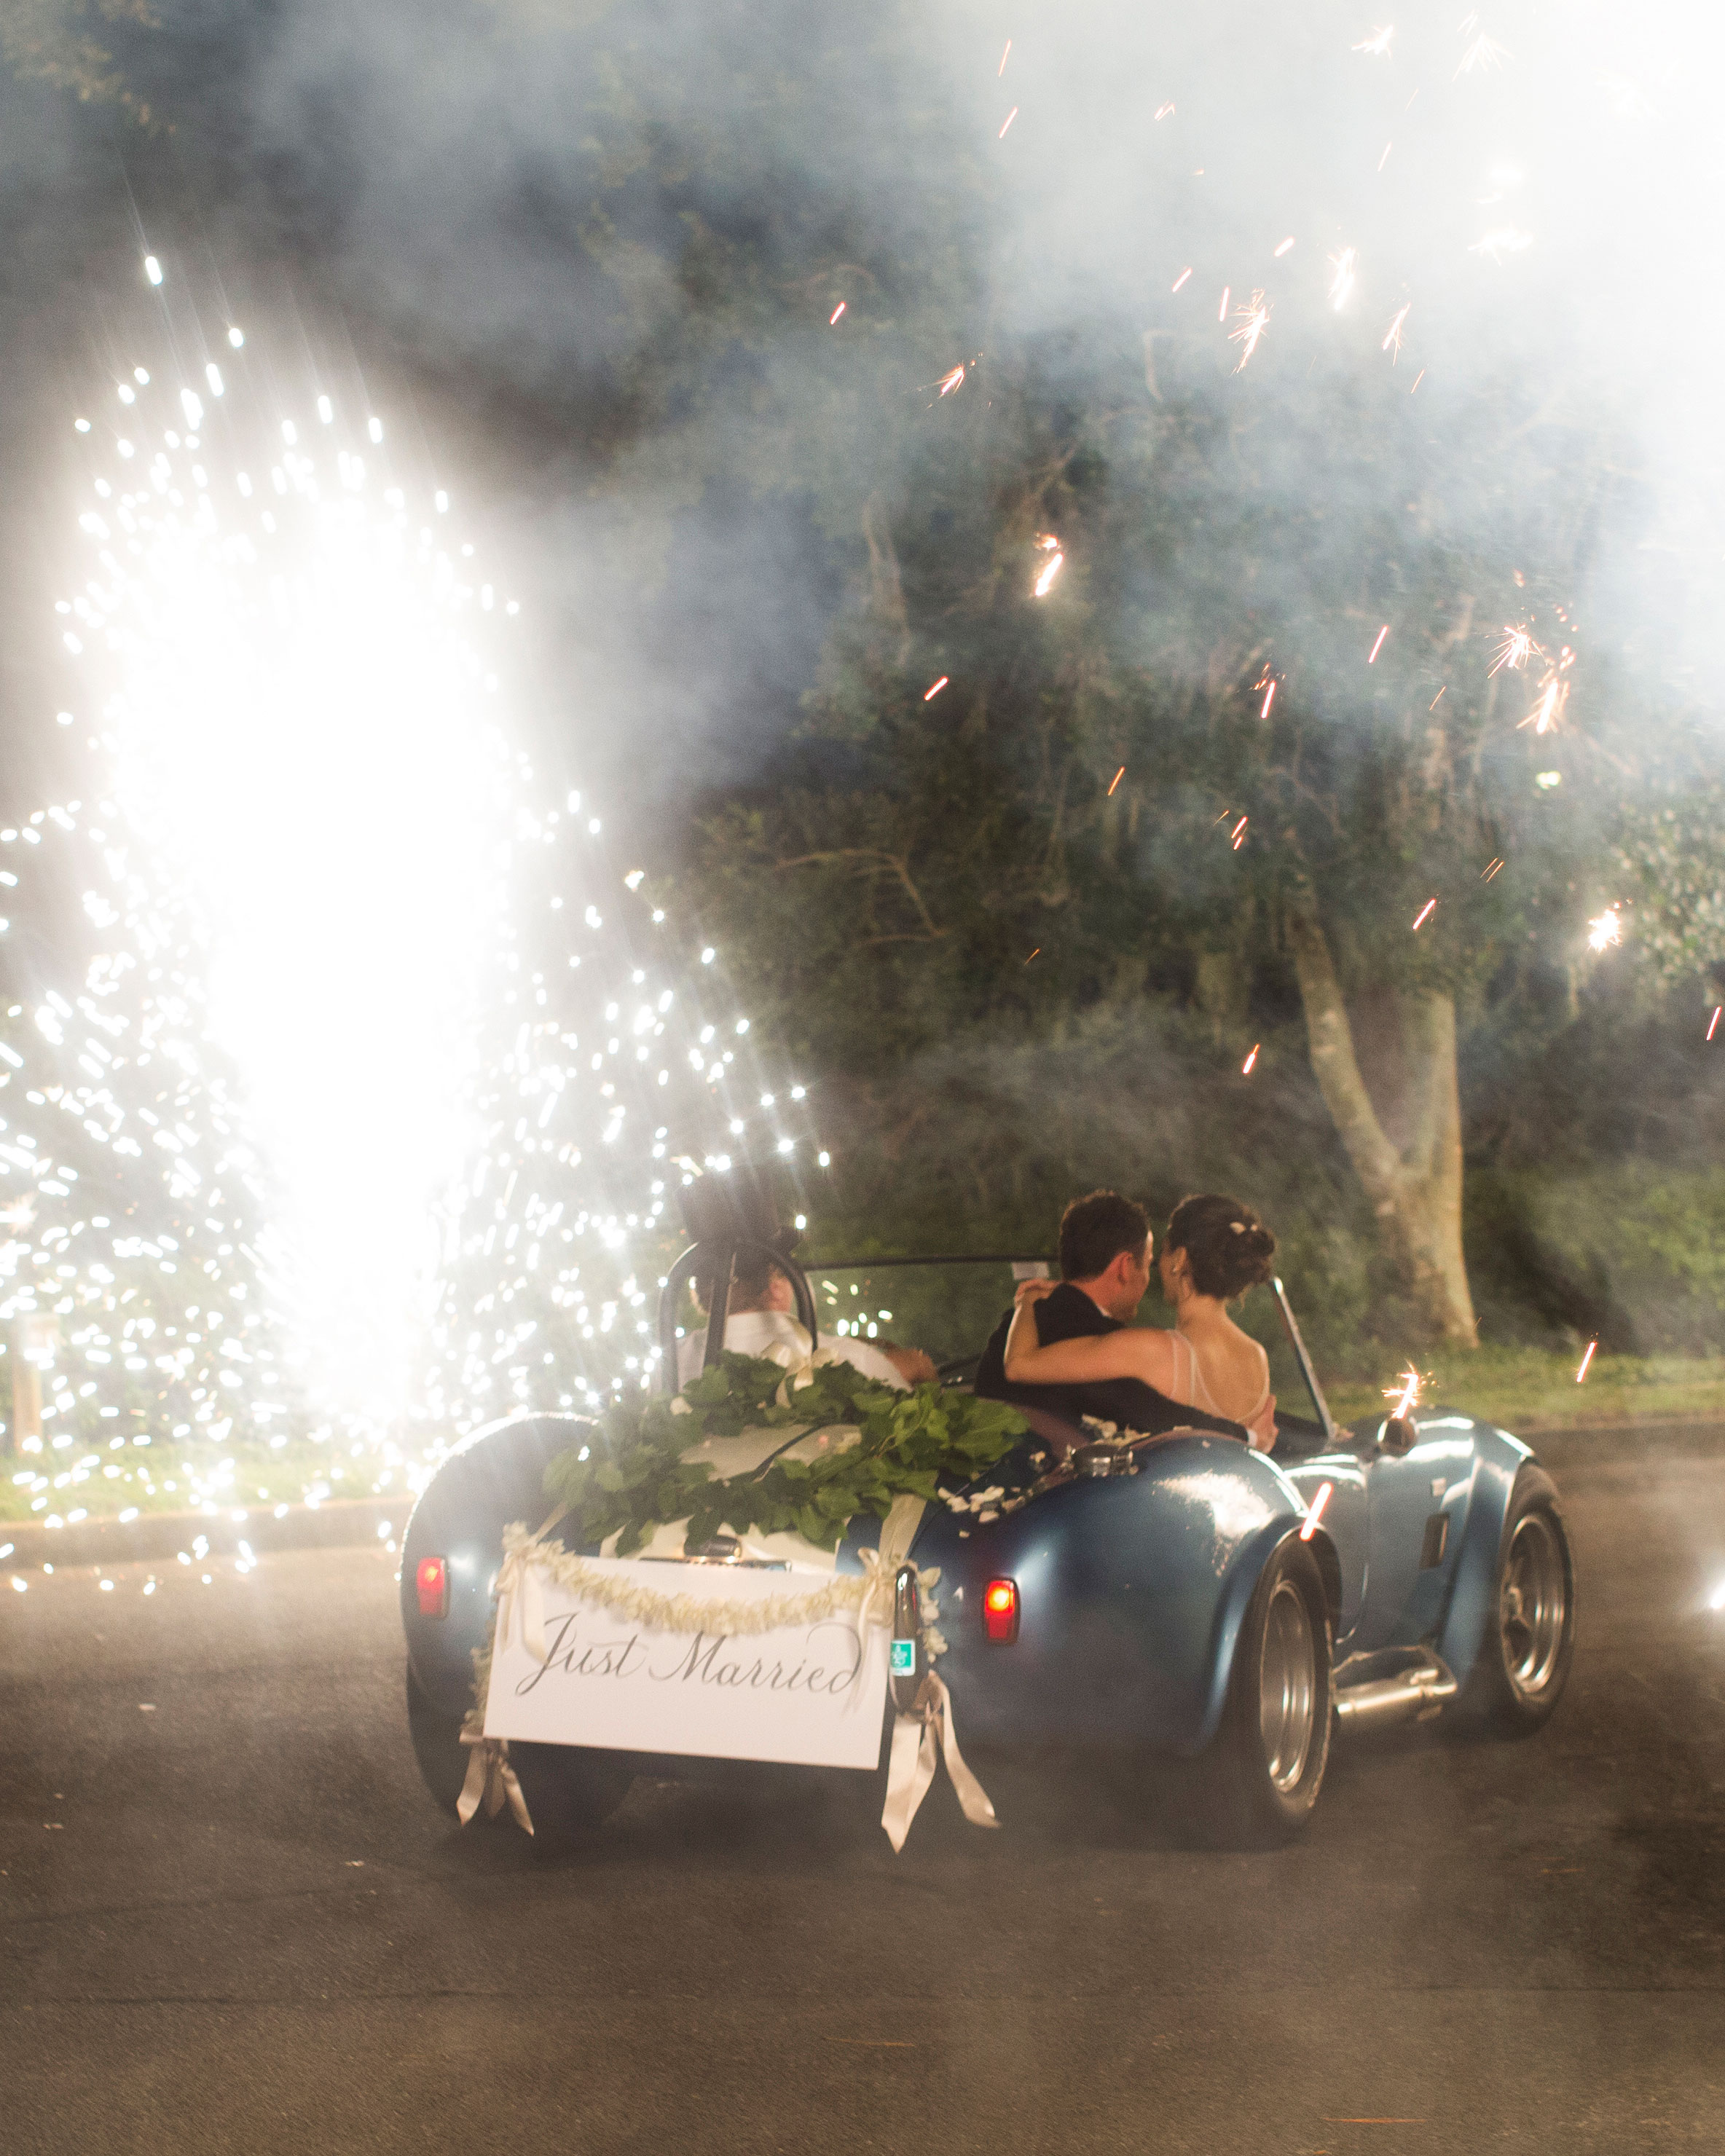 nancy-nathan-wedding-getaway-1648-6141569-0816.jpg